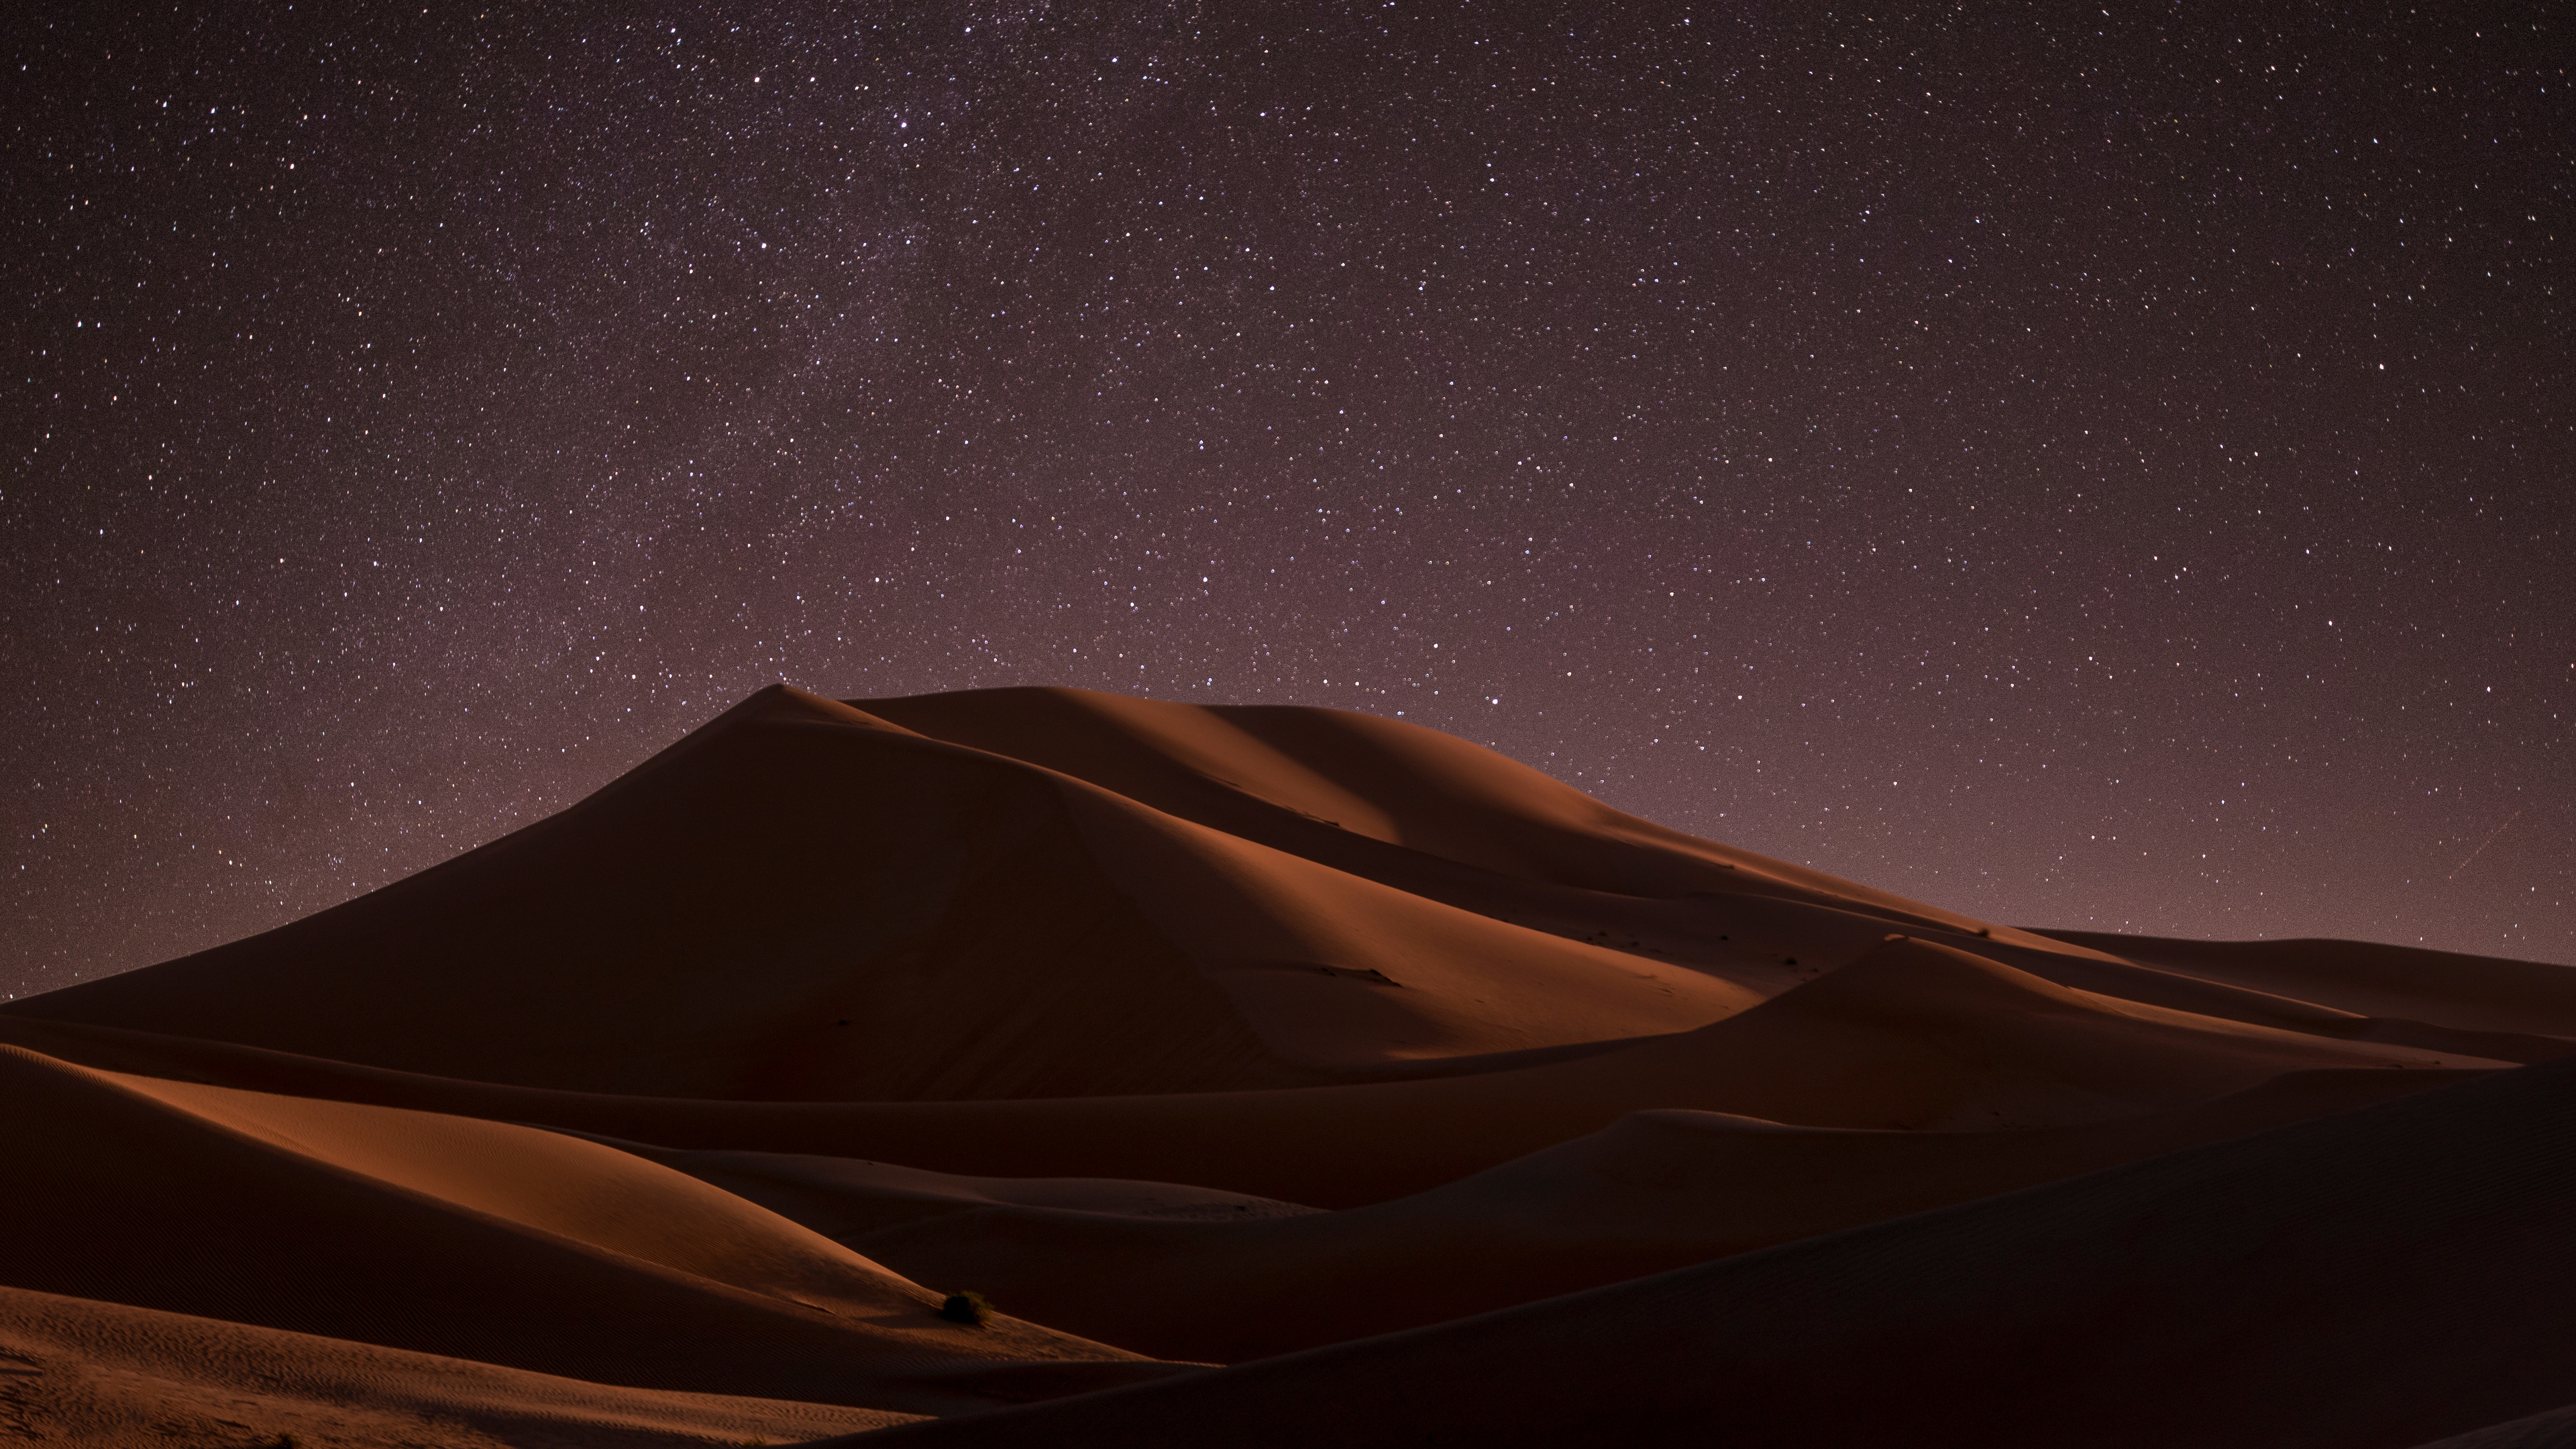 desert nightime stars 4k 1540136215 - Desert Nightime Stars 4k - stars wallpapers, sky wallpapers, night wallpapers, nature wallpapers, mountains wallpapers, hd-wallpapers, desert wallpapers, 5k wallpapers, 4k-wallpapers